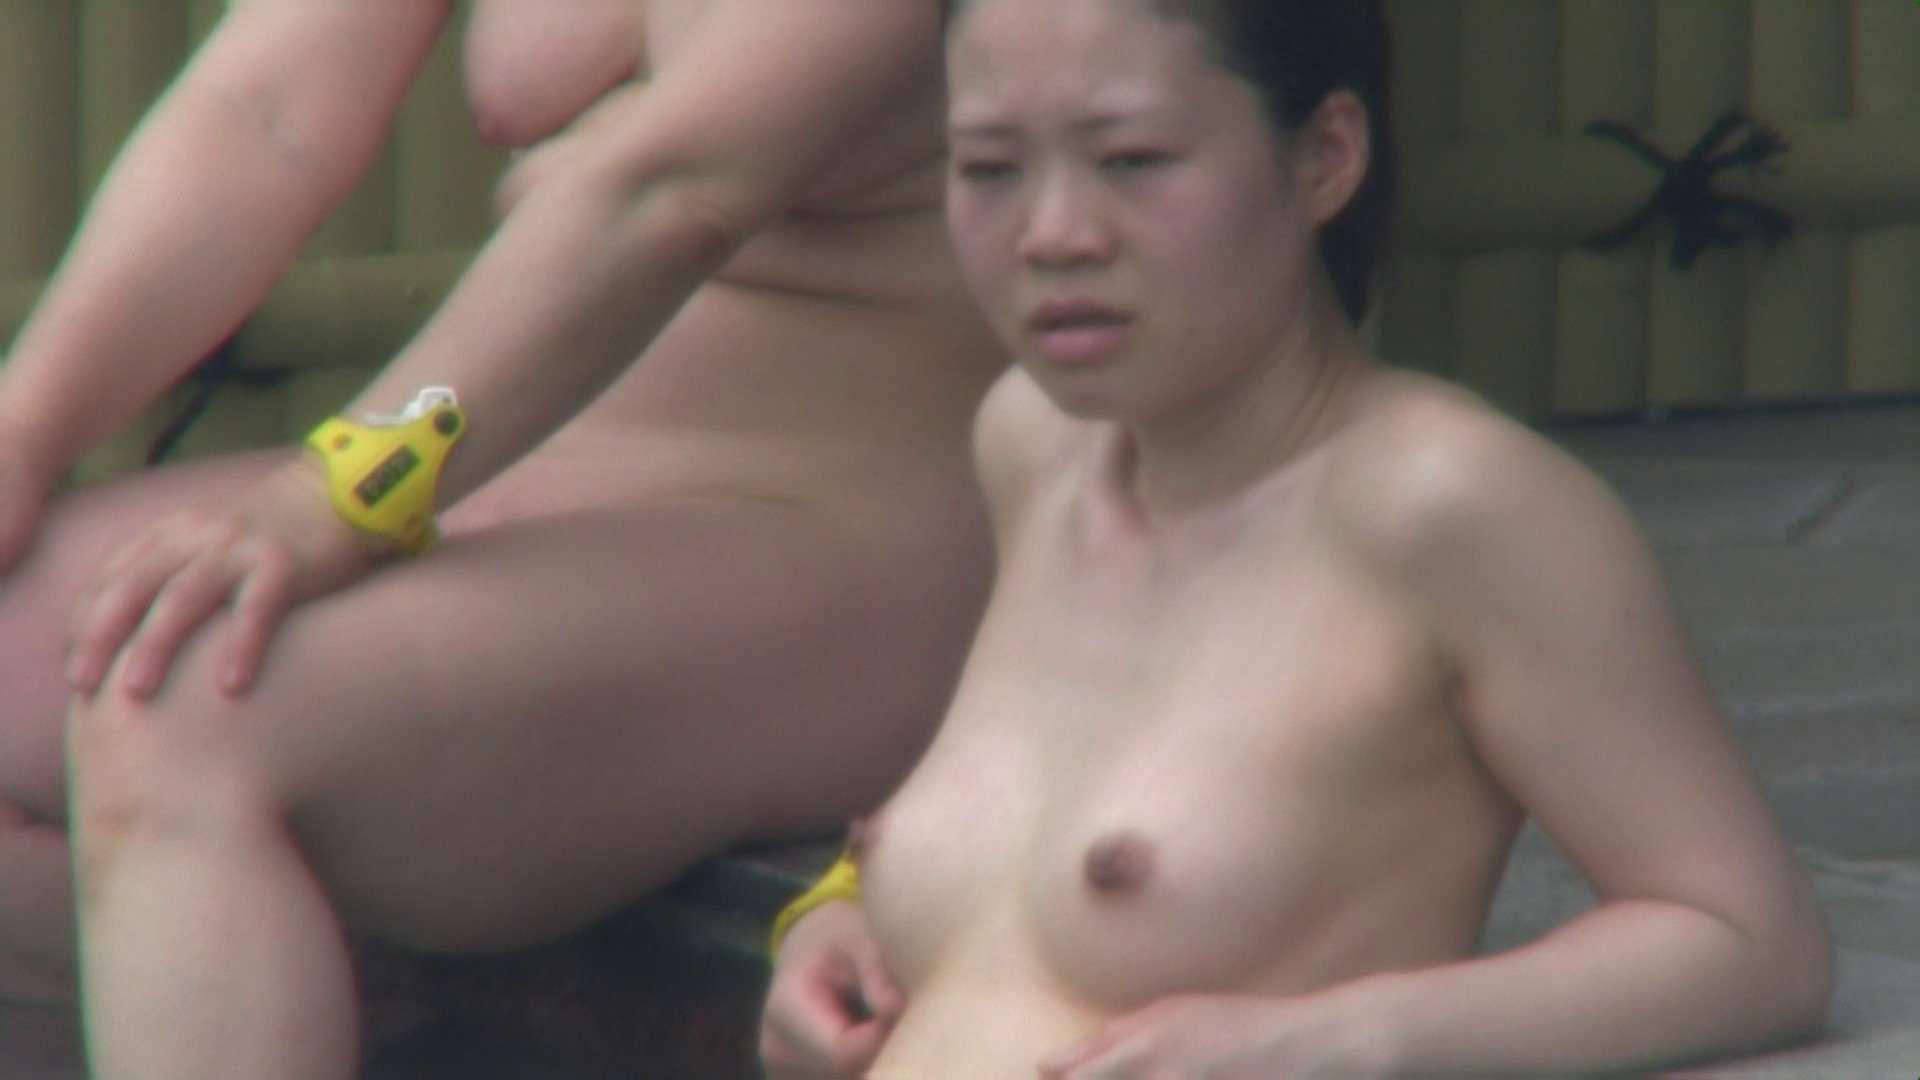 Aquaな露天風呂Vol.63【VIP限定】 HなOL おめこ無修正動画無料 100pic 97